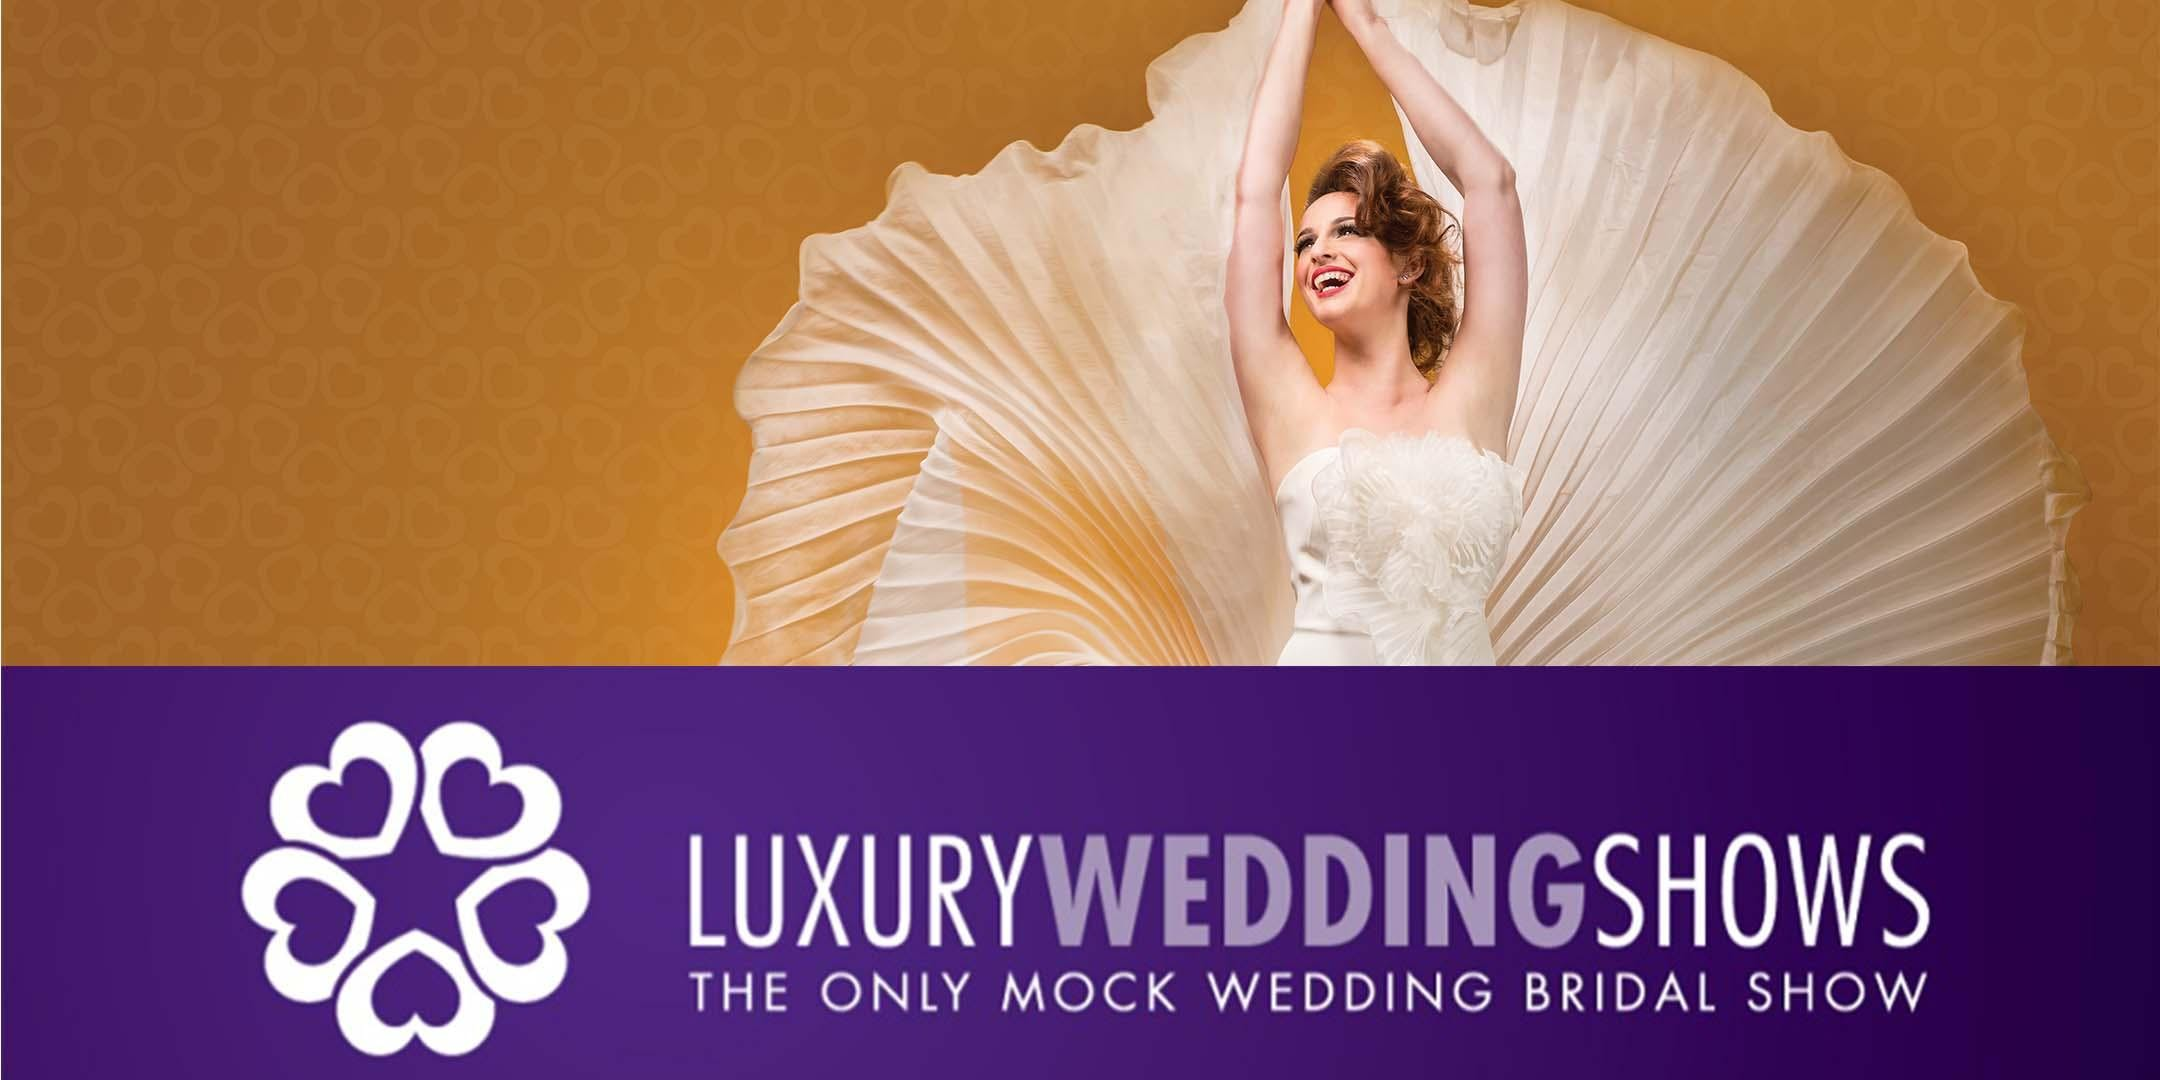 Luxury Wedding Show - Outdoor Wedding Edition